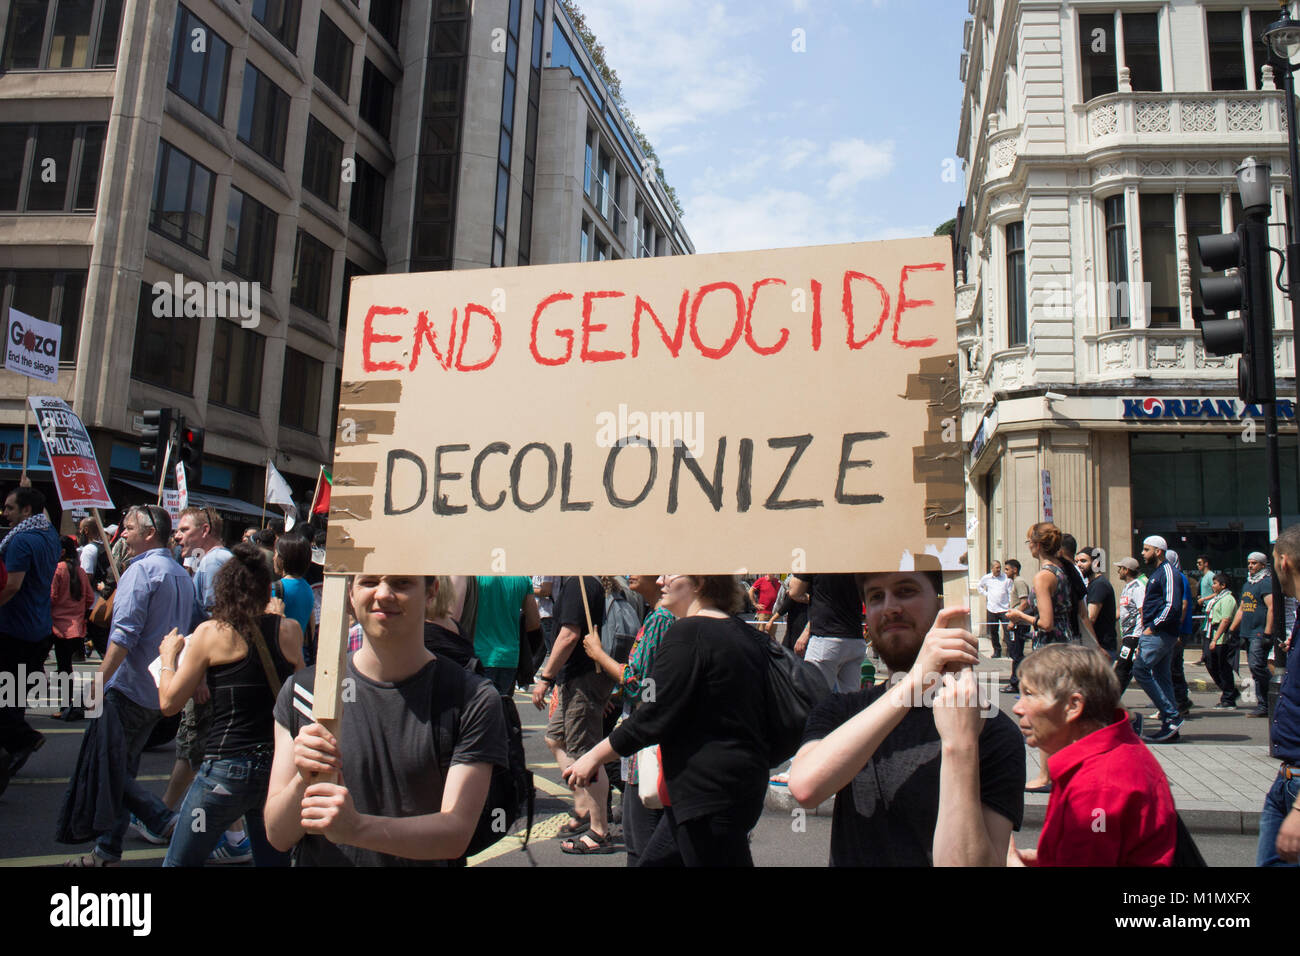 End Genocide - Free Gaza Demo - Stock Image